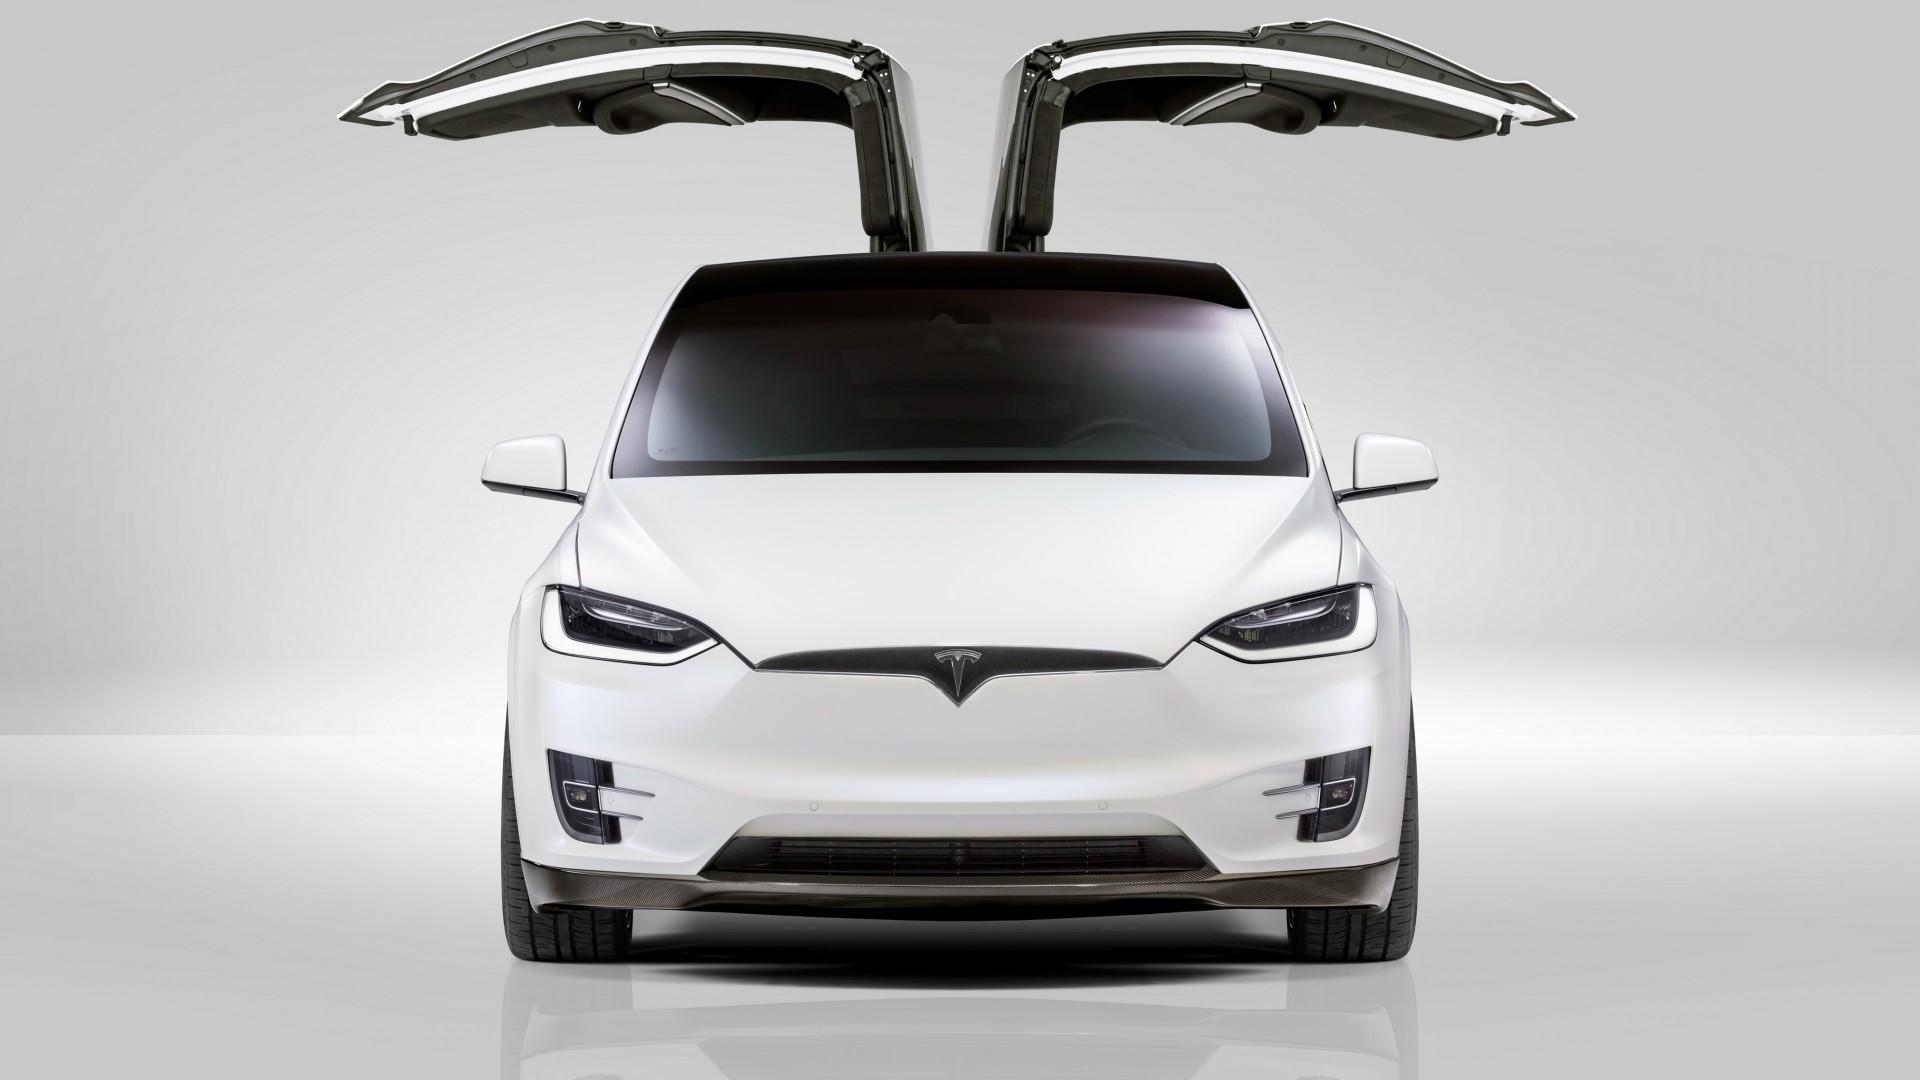 2018 novitec tesla model x 4k wallpaper hd car wallpapers id 7973 - Tesla wallpaper android ...